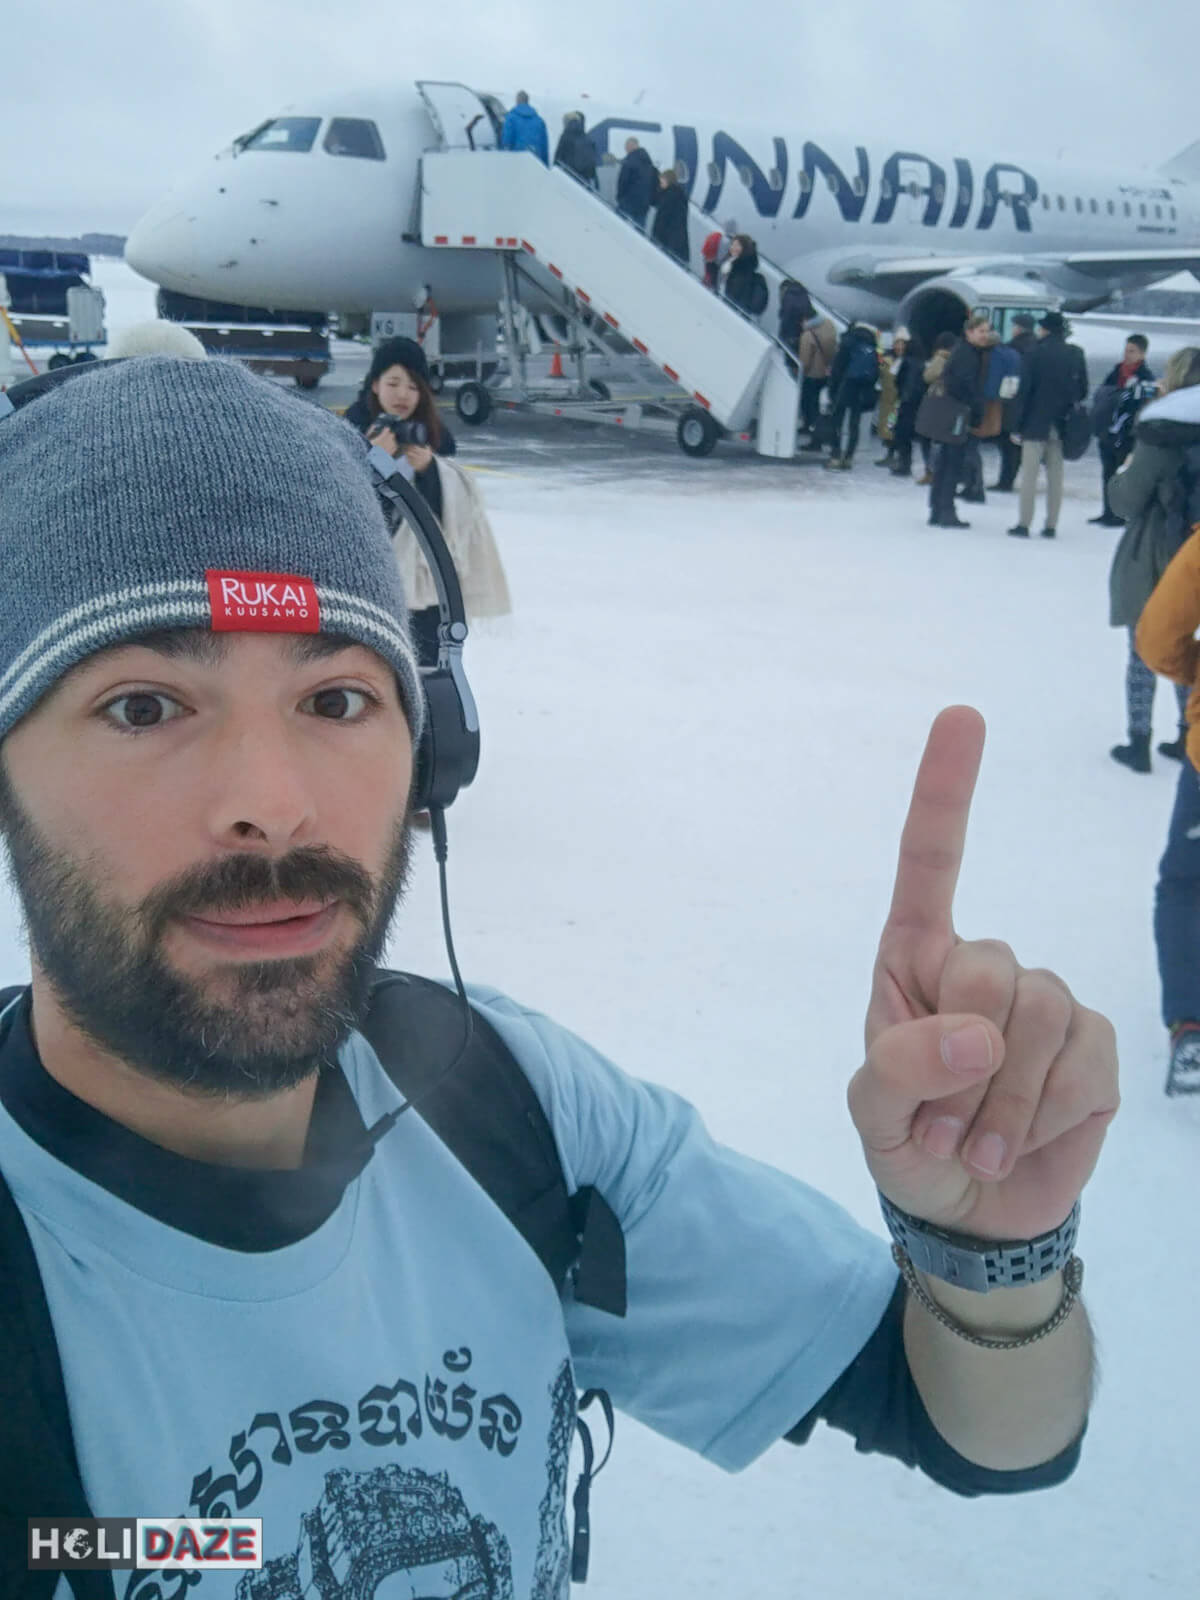 Flying Finnair around Lapland in Northern Finland -- best airlines ever!